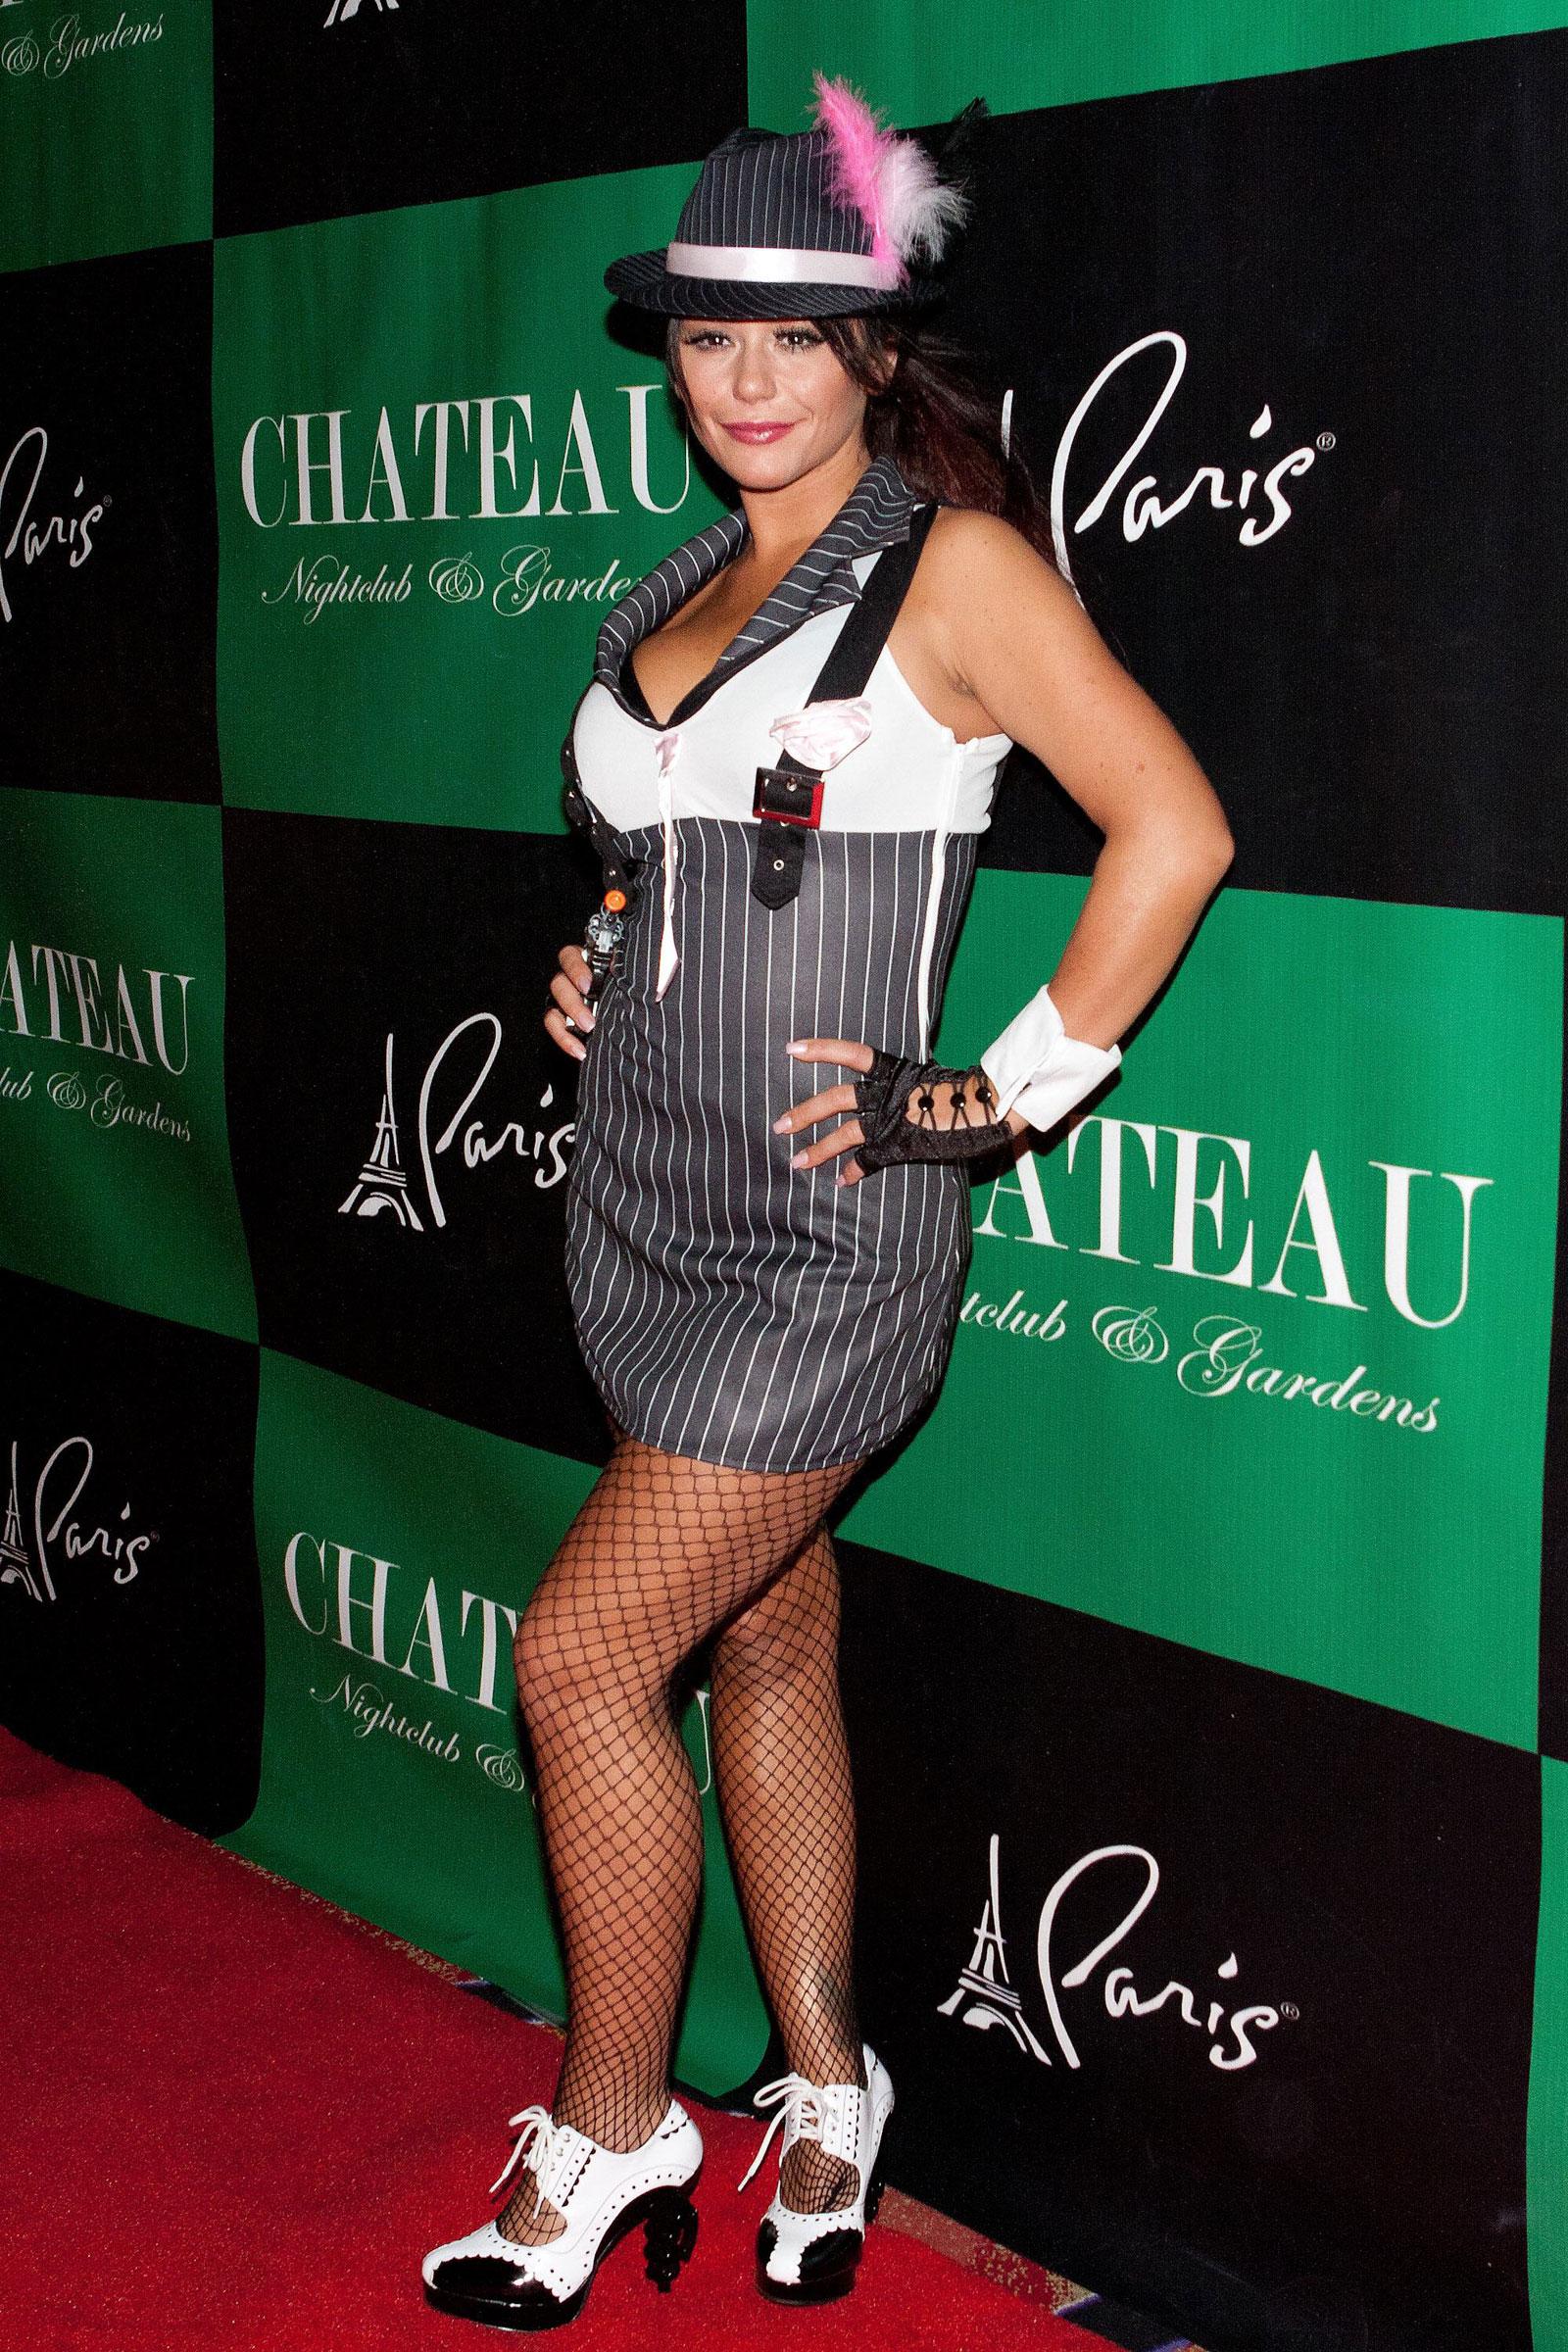 Farley at pimp n ho costume ball at chateau nightclub in las vegas